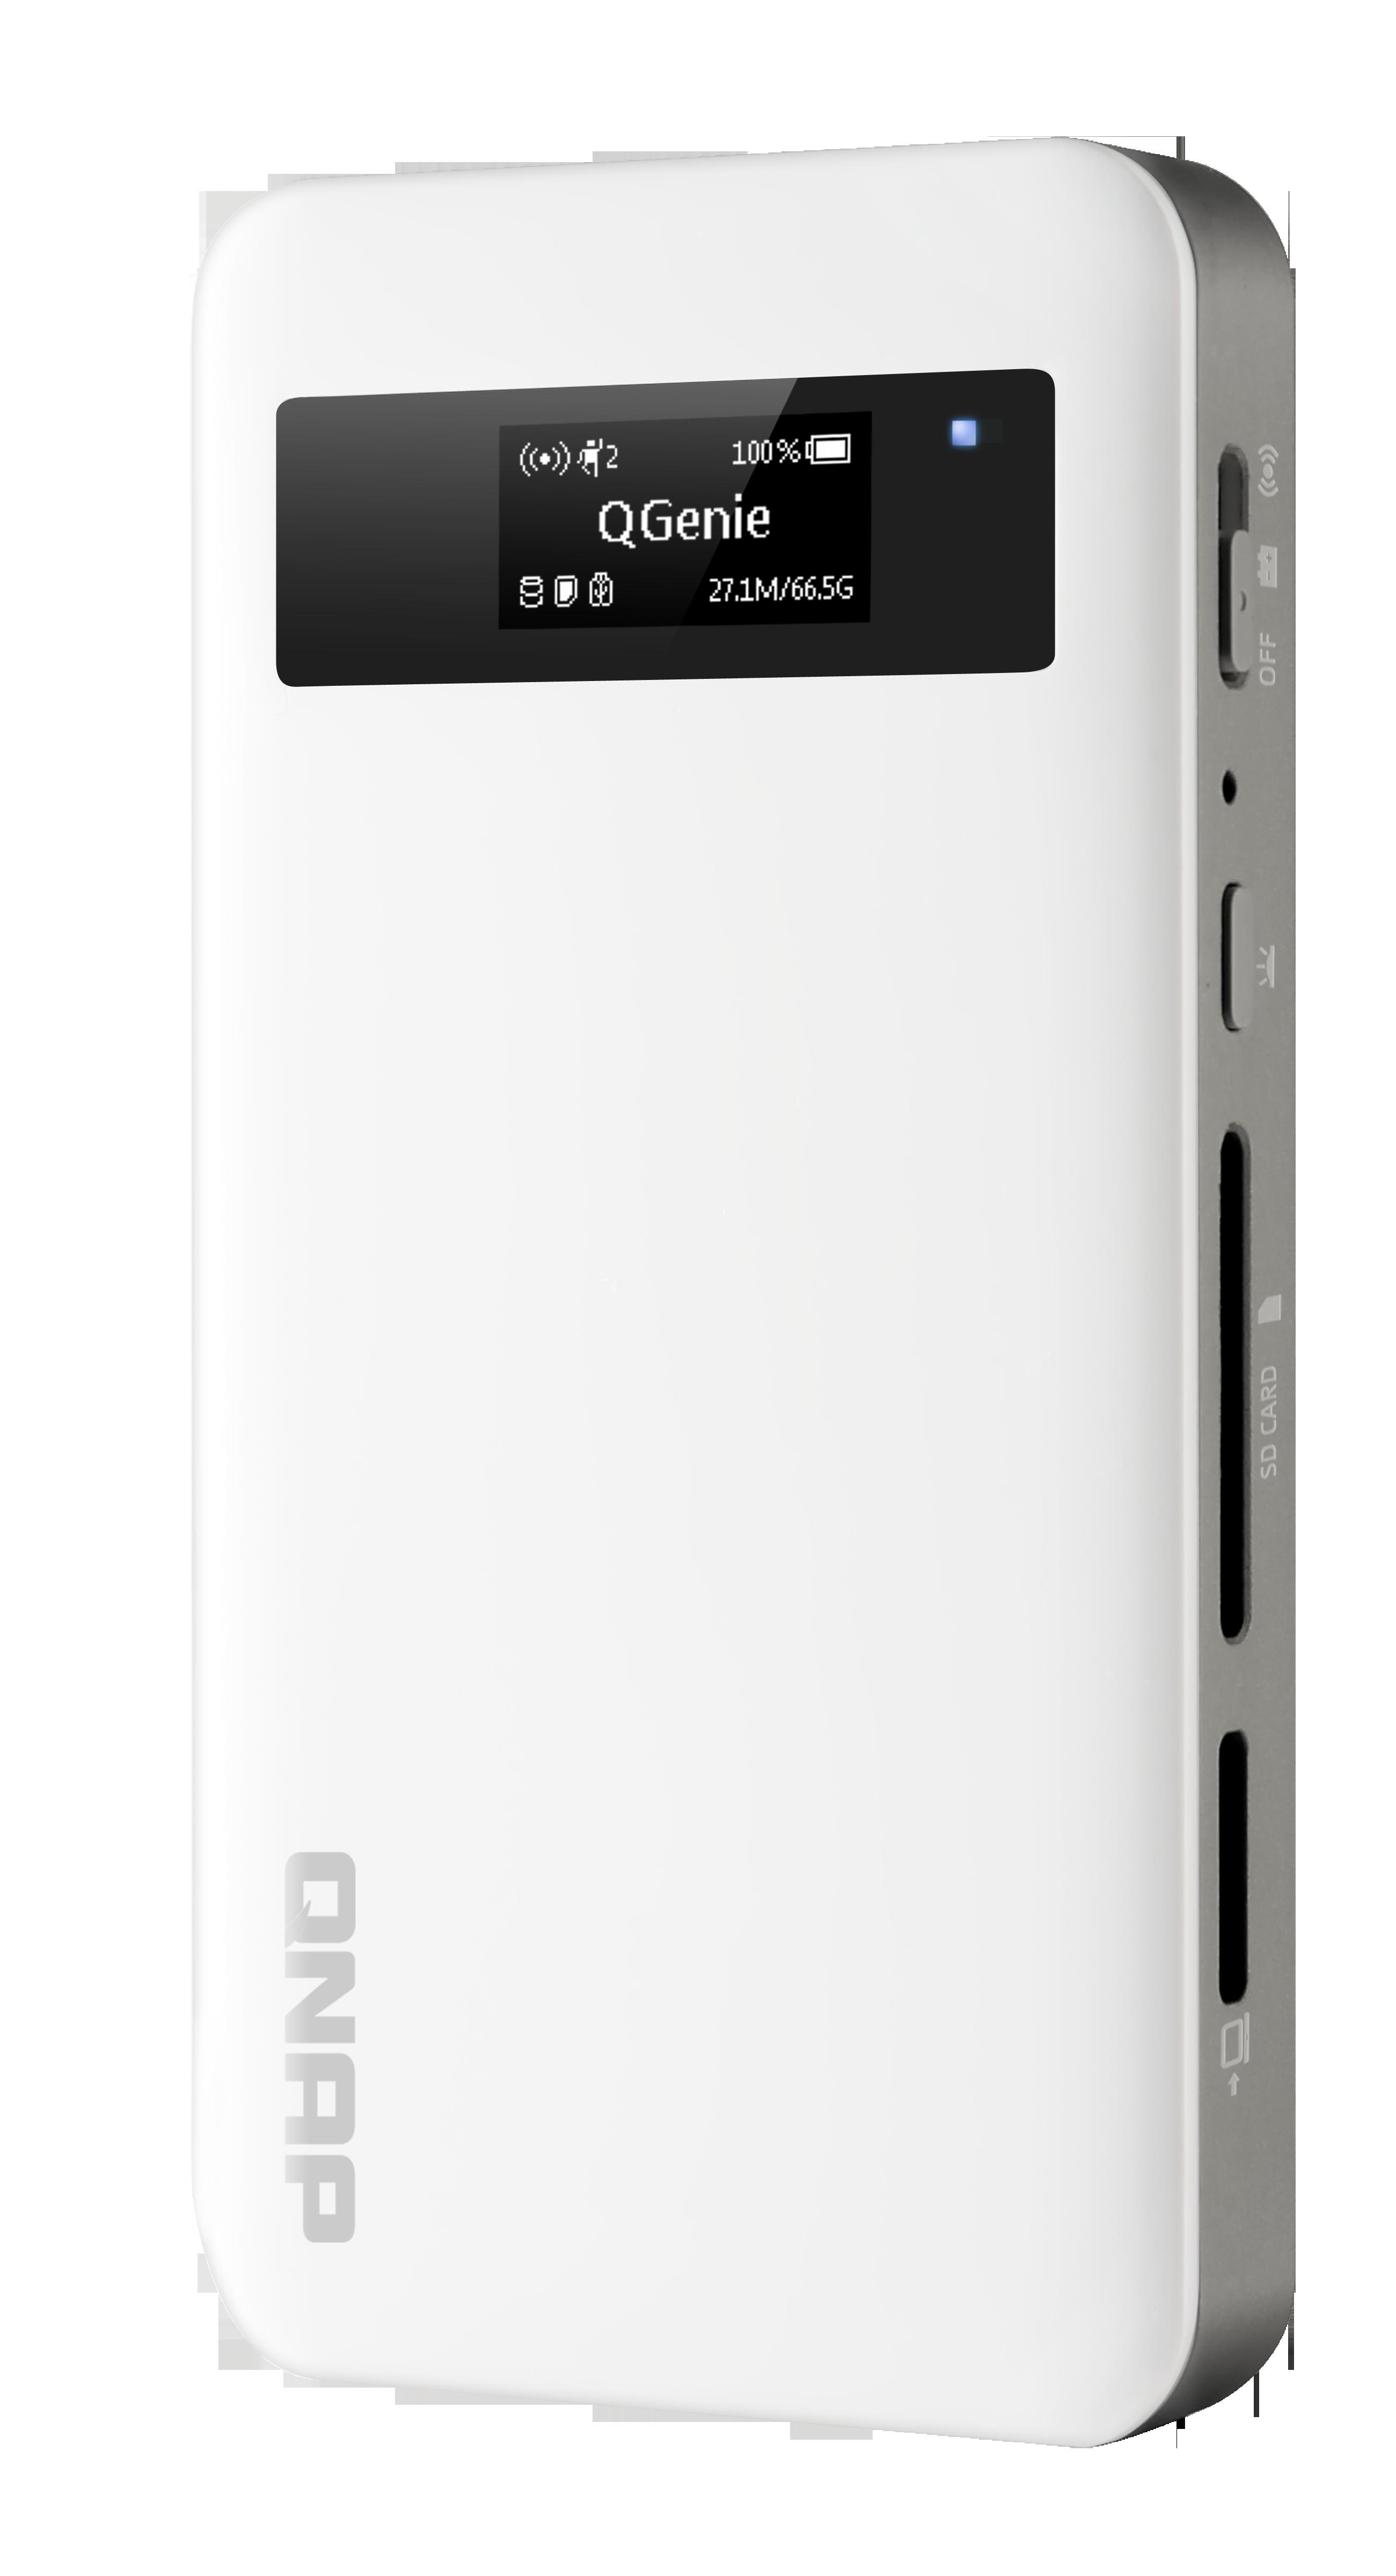 QNAP QGenie Mobile NAS